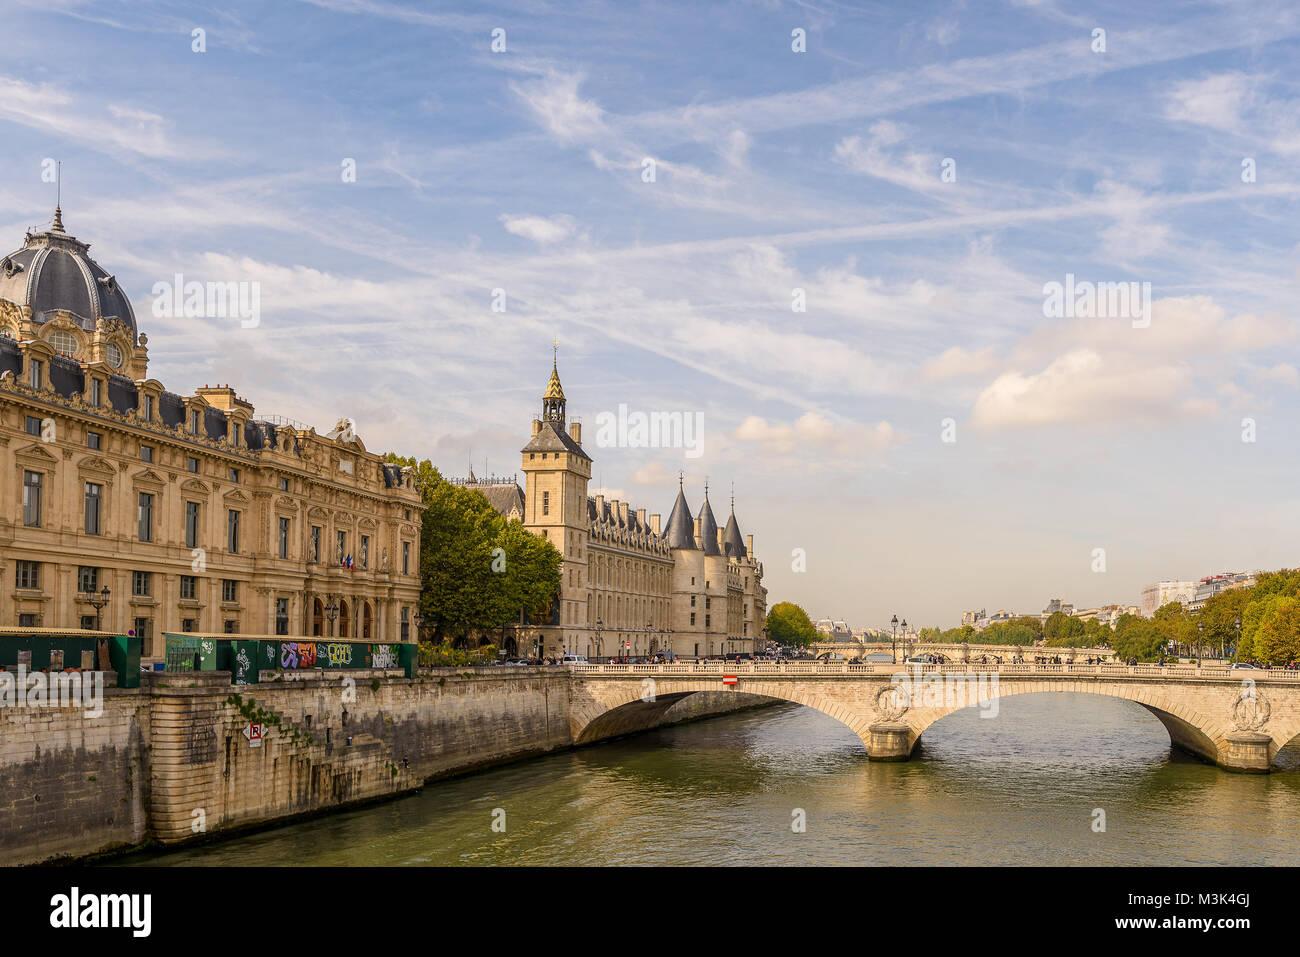 Color outdoor Paris cityscape photo of the bride Pont au Change over river Seine,view towards the commercial court,conciergerie,french - Stock Image